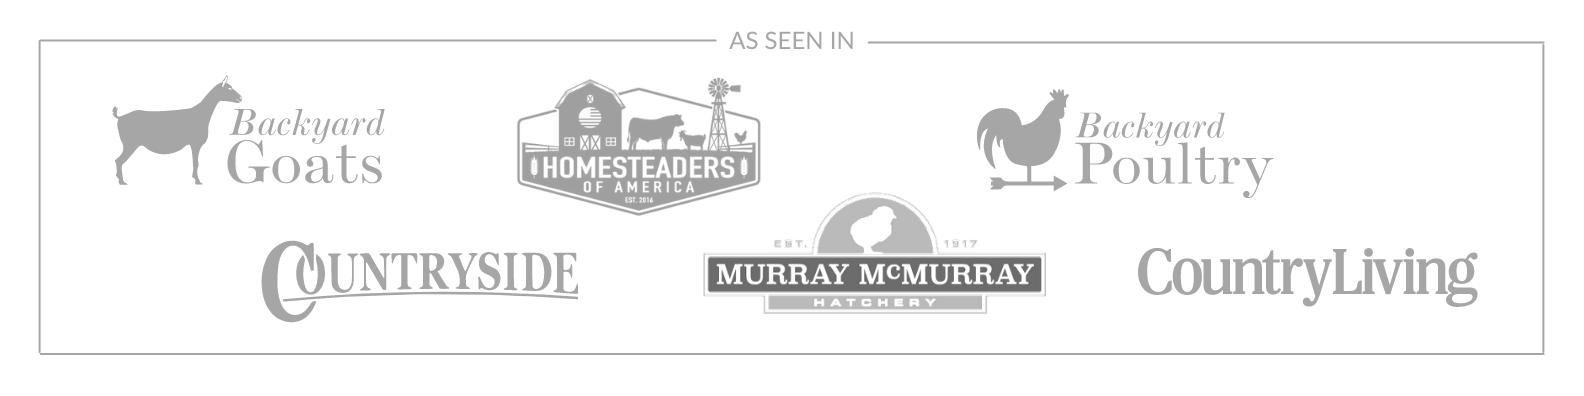 Business logos for Backyard Goats Magazine, Homesteaders of America, Backyard Poultry Magazine, Countryside Magazine, McMurray Hatchery, Country Living Magazine